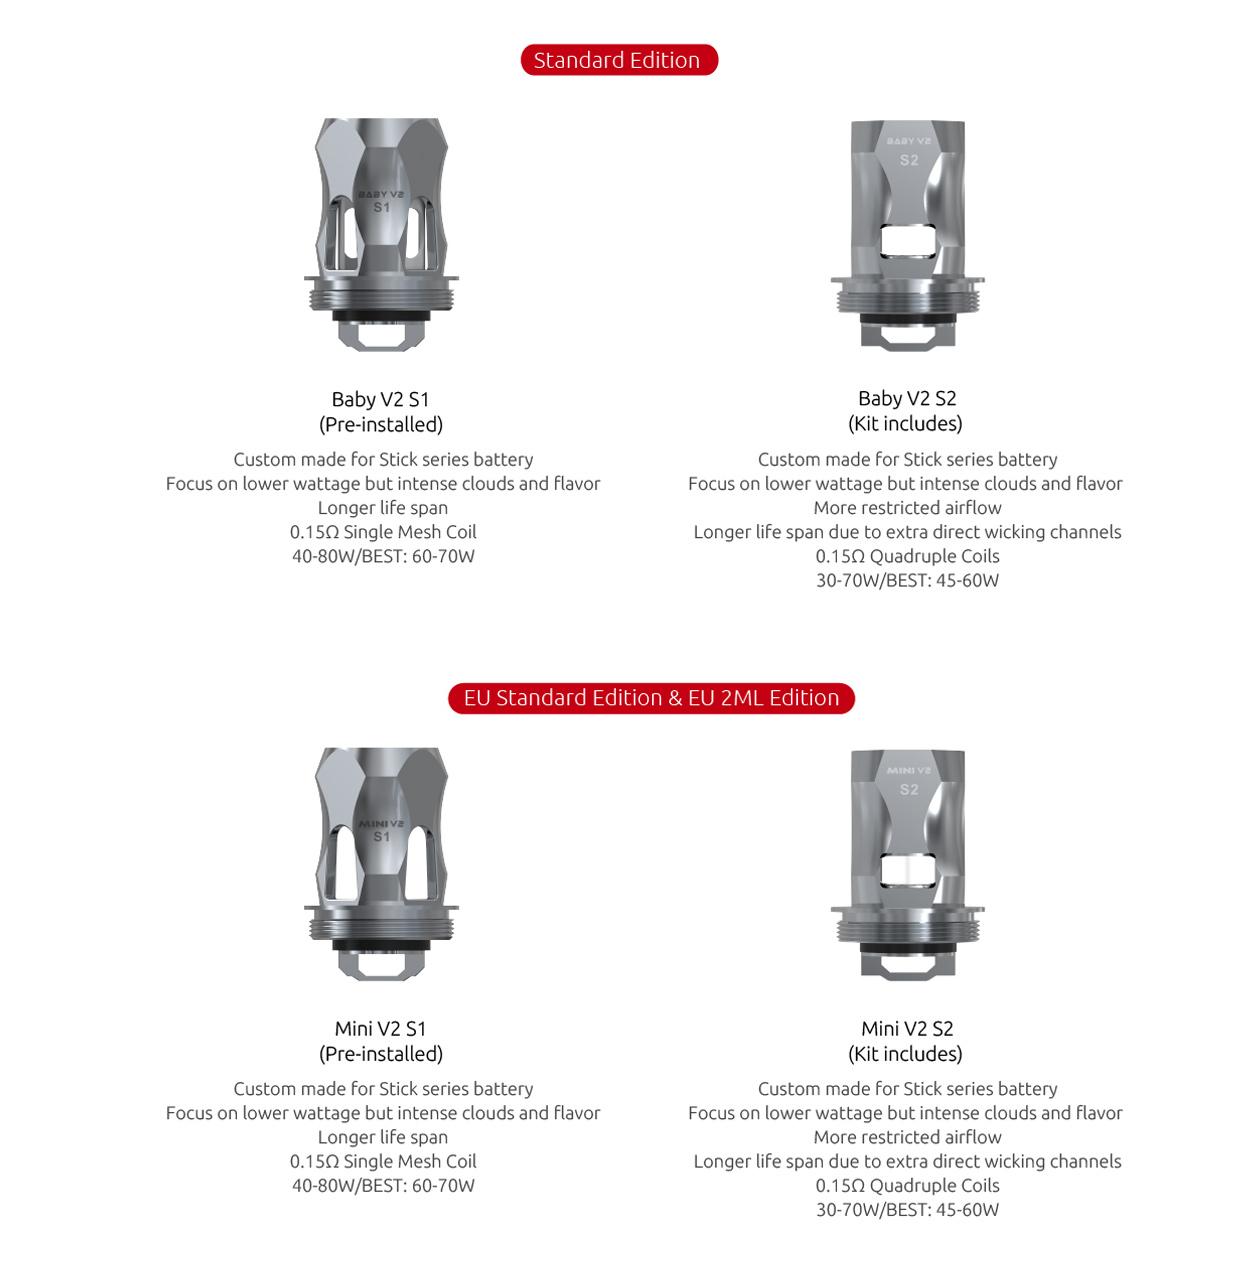 Smok_Stick_V9_Hyper_Engine_Coils_S1_S2_Specifications_Ohms_wattage